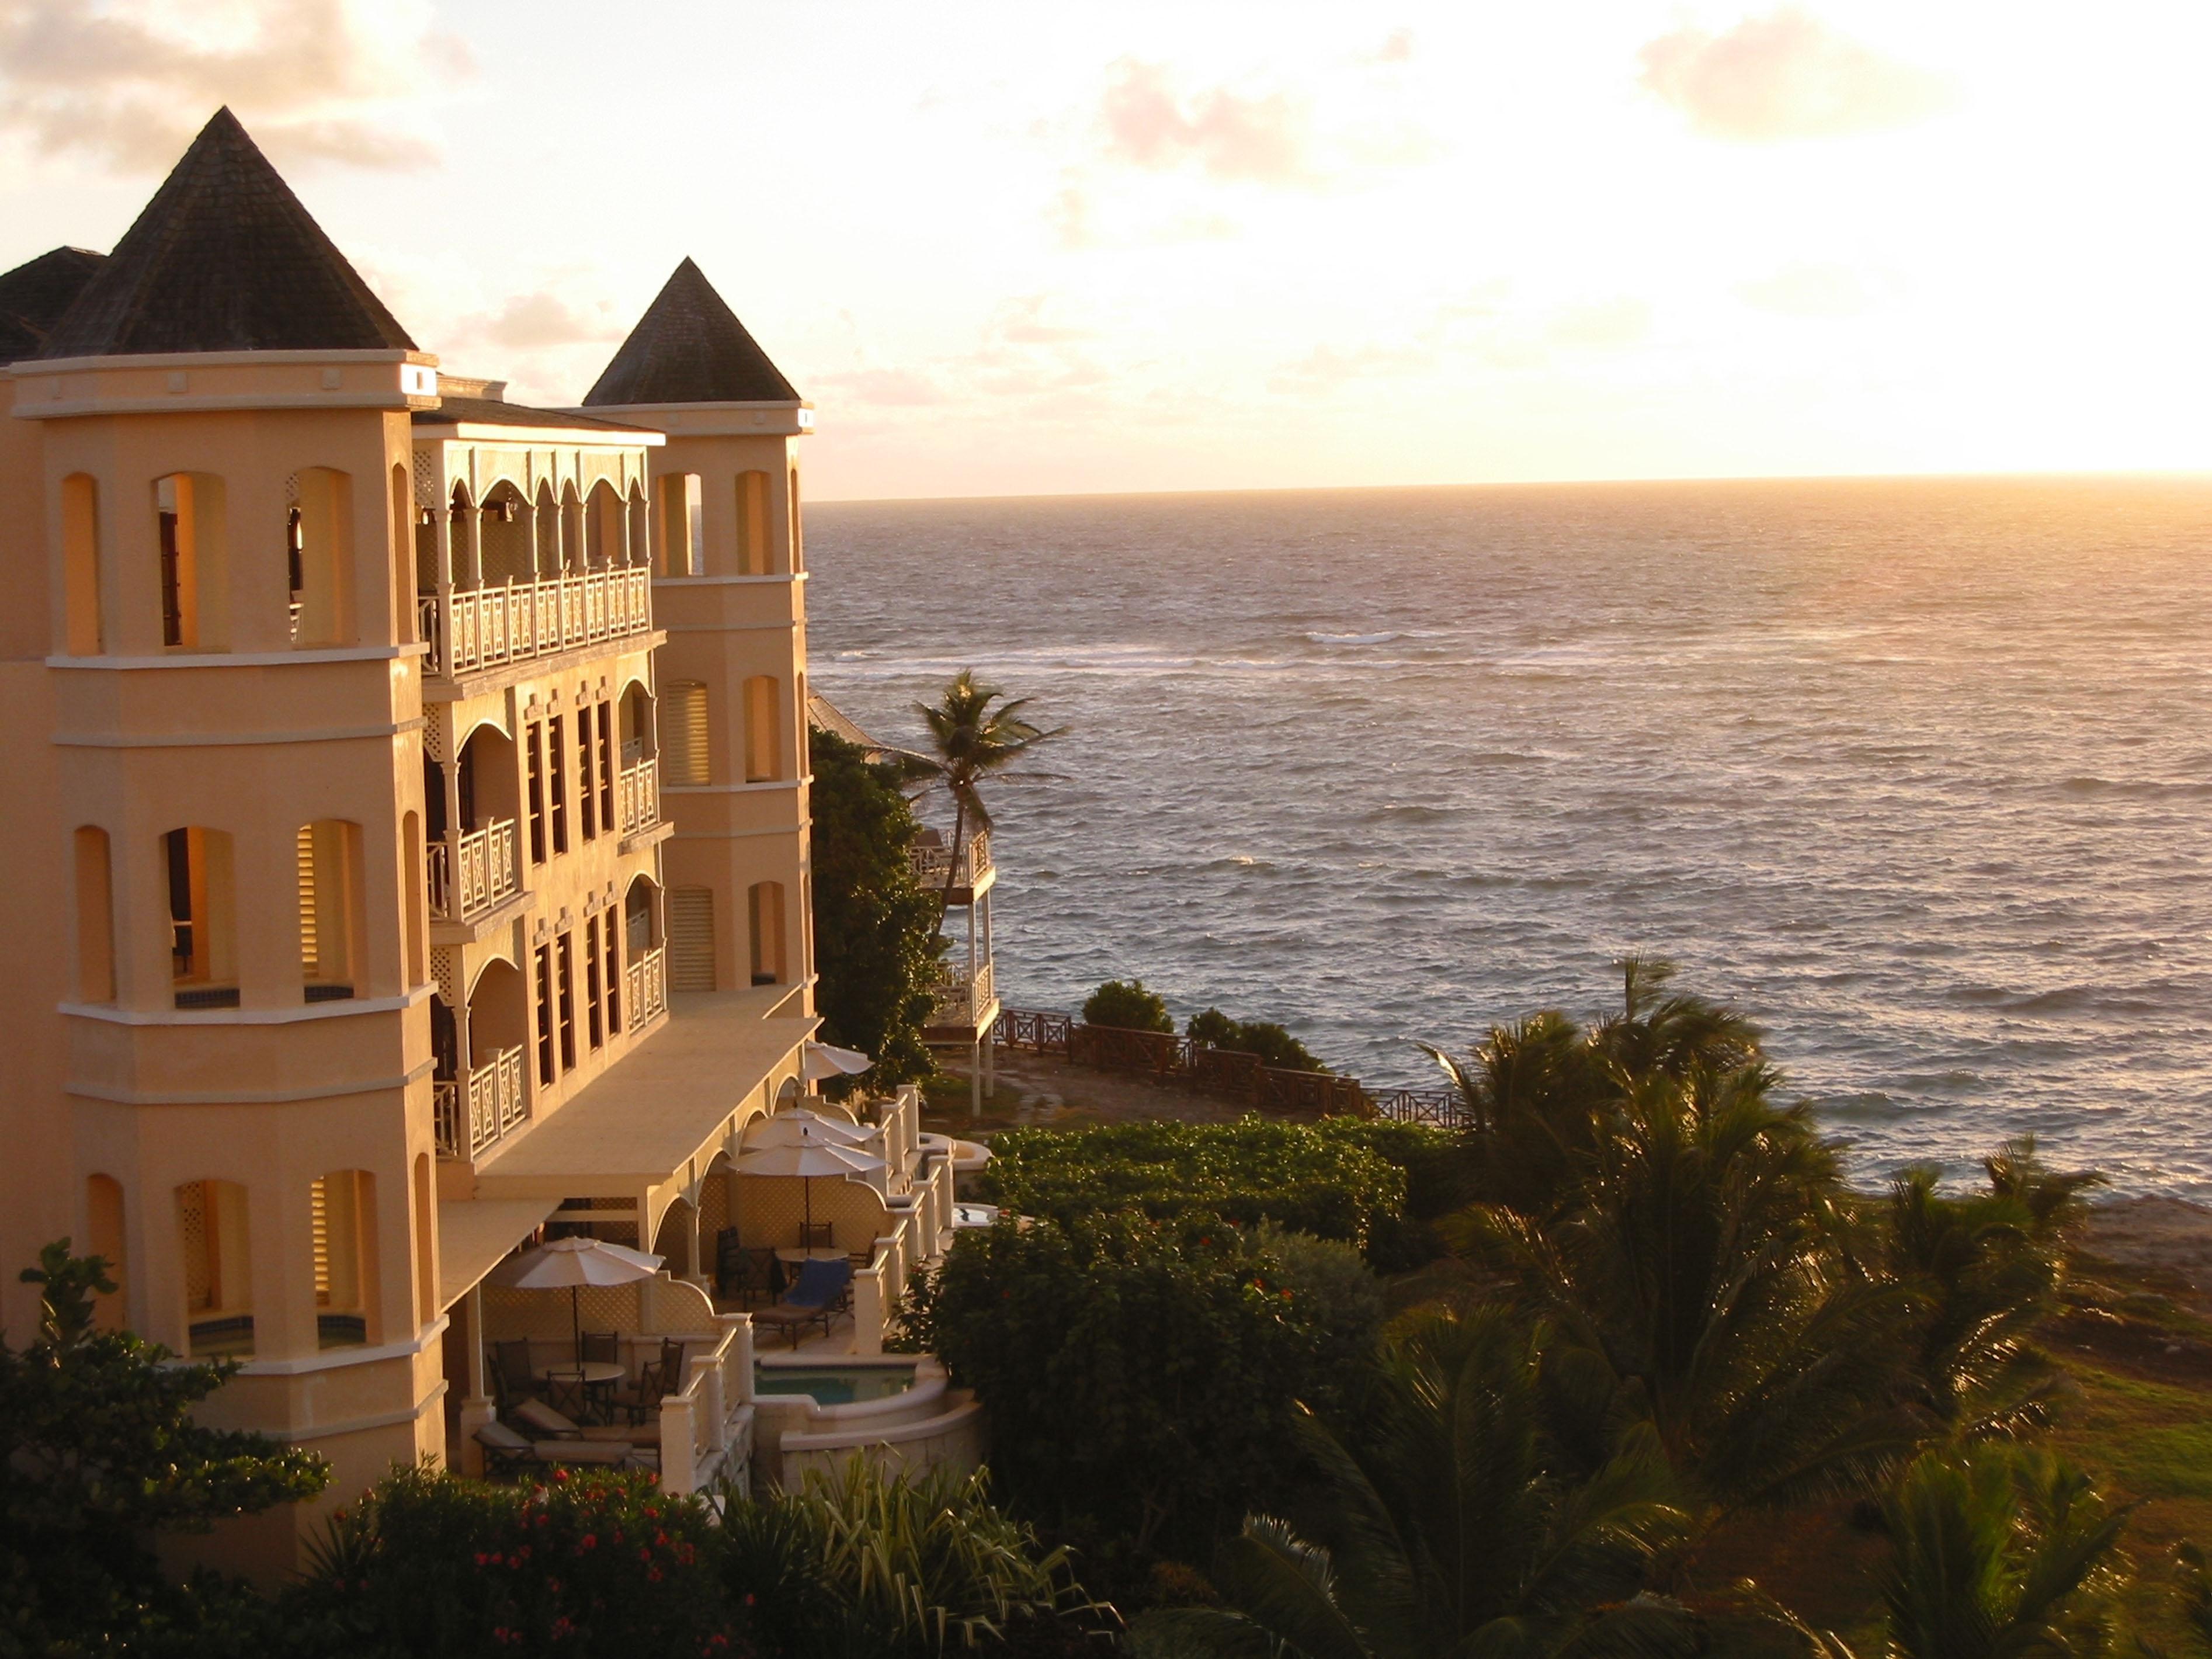 Sunrise at The Crane Resort, Barbados.